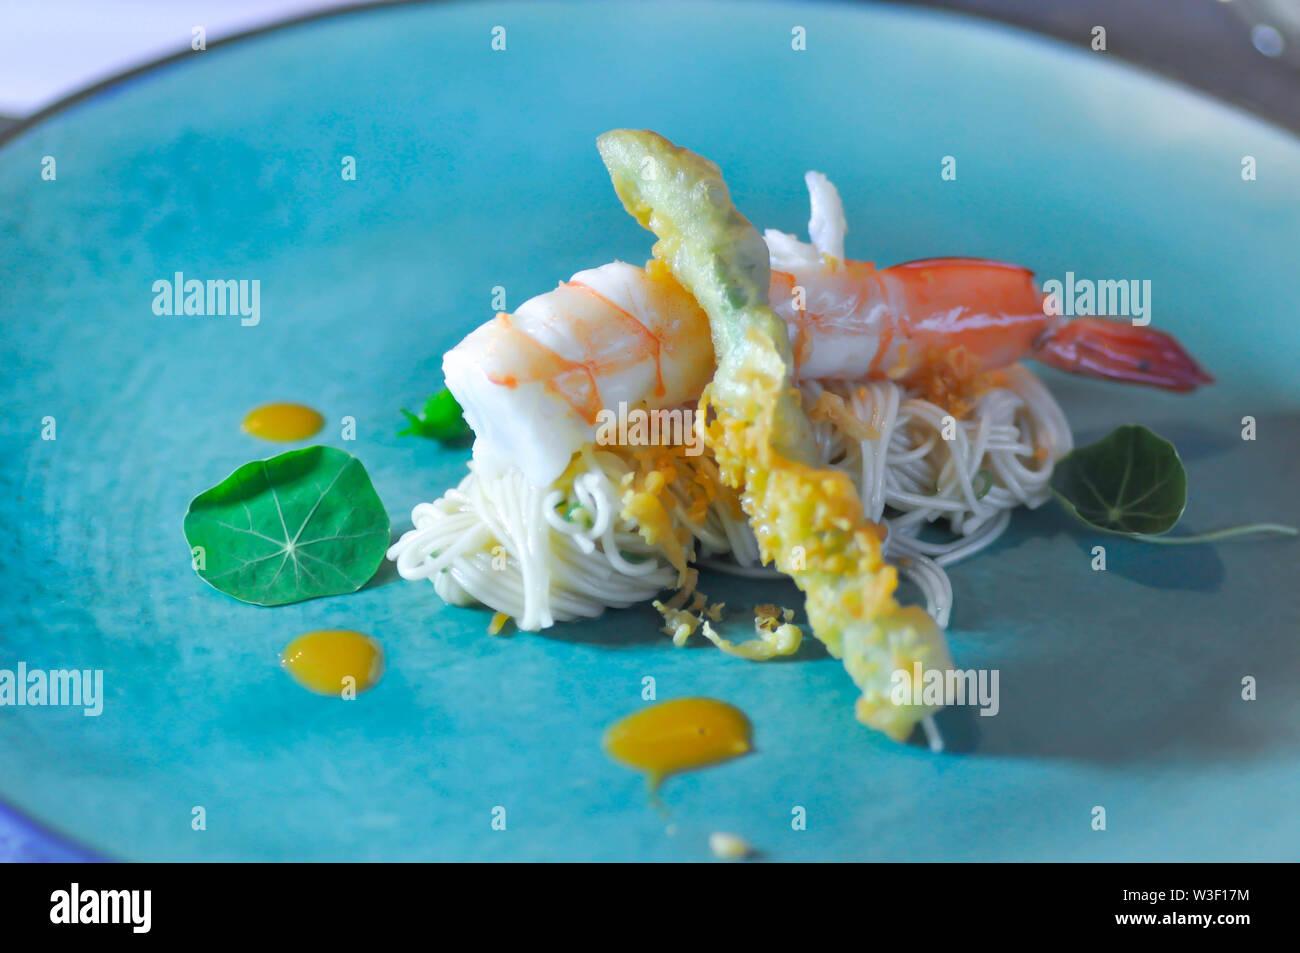 soba ,shrimp noodles in tiny serve or tiny noodles - Stock Image